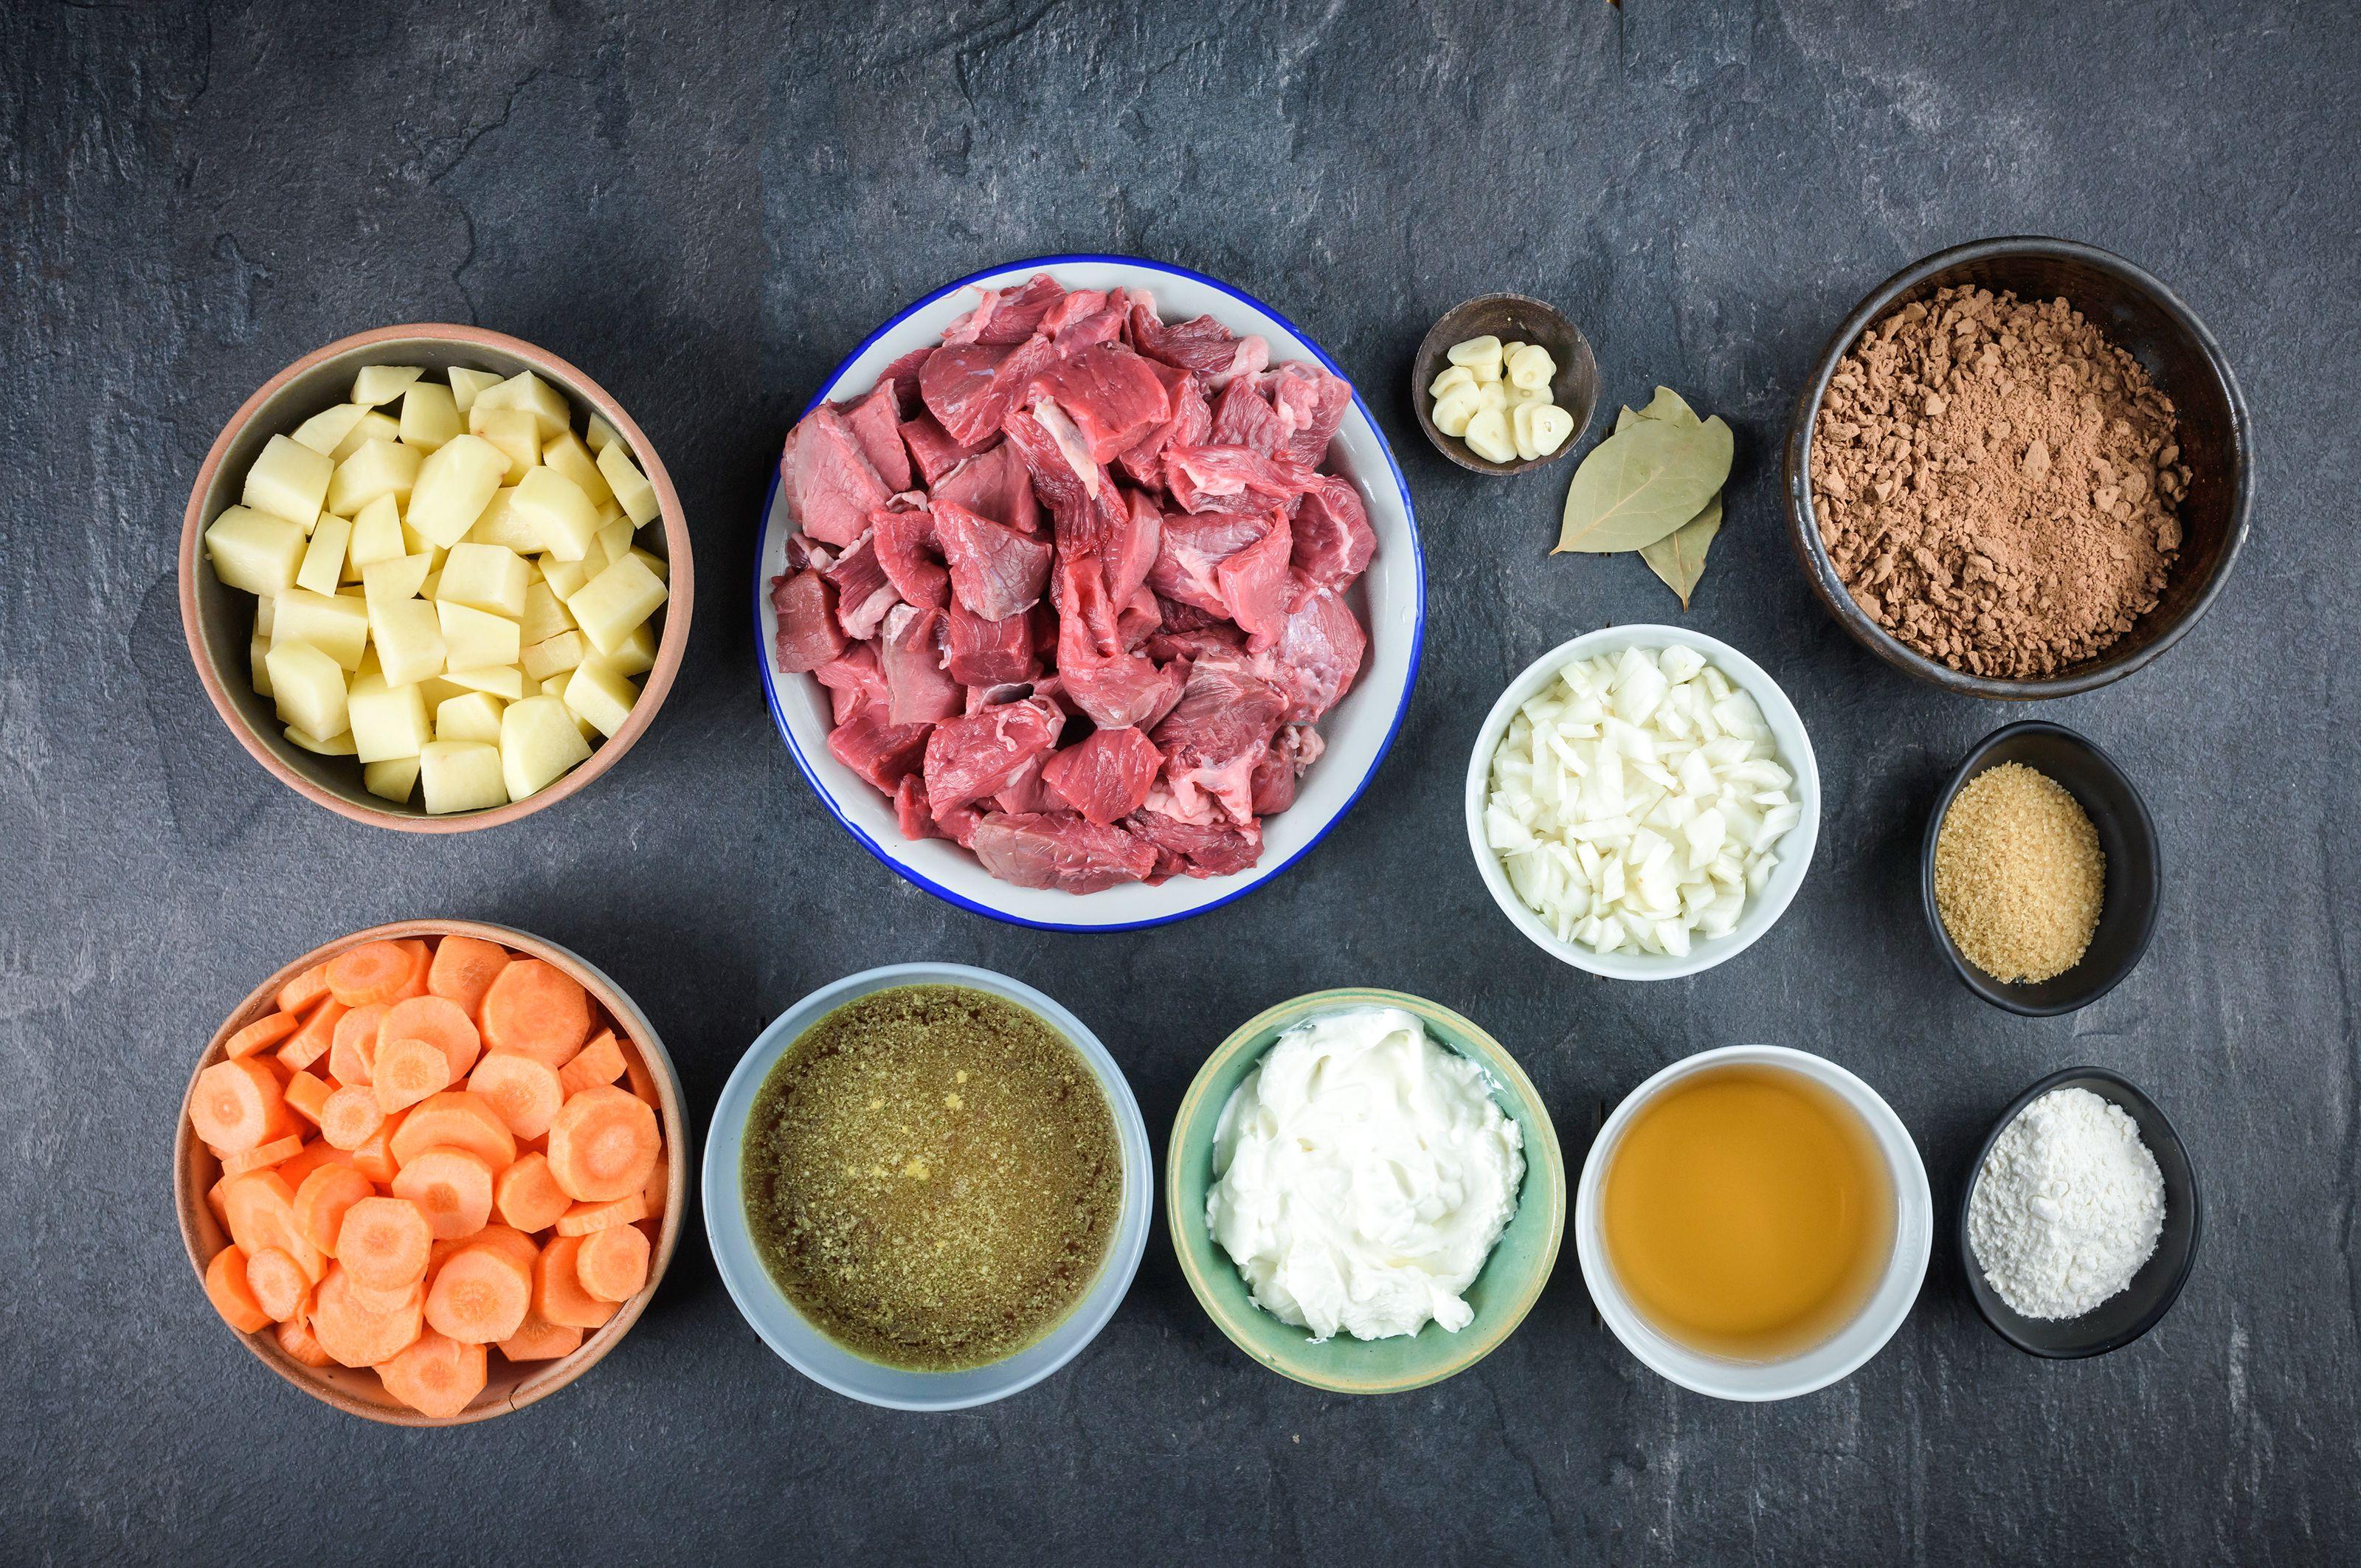 Ingredients for crockpot sauerbraten